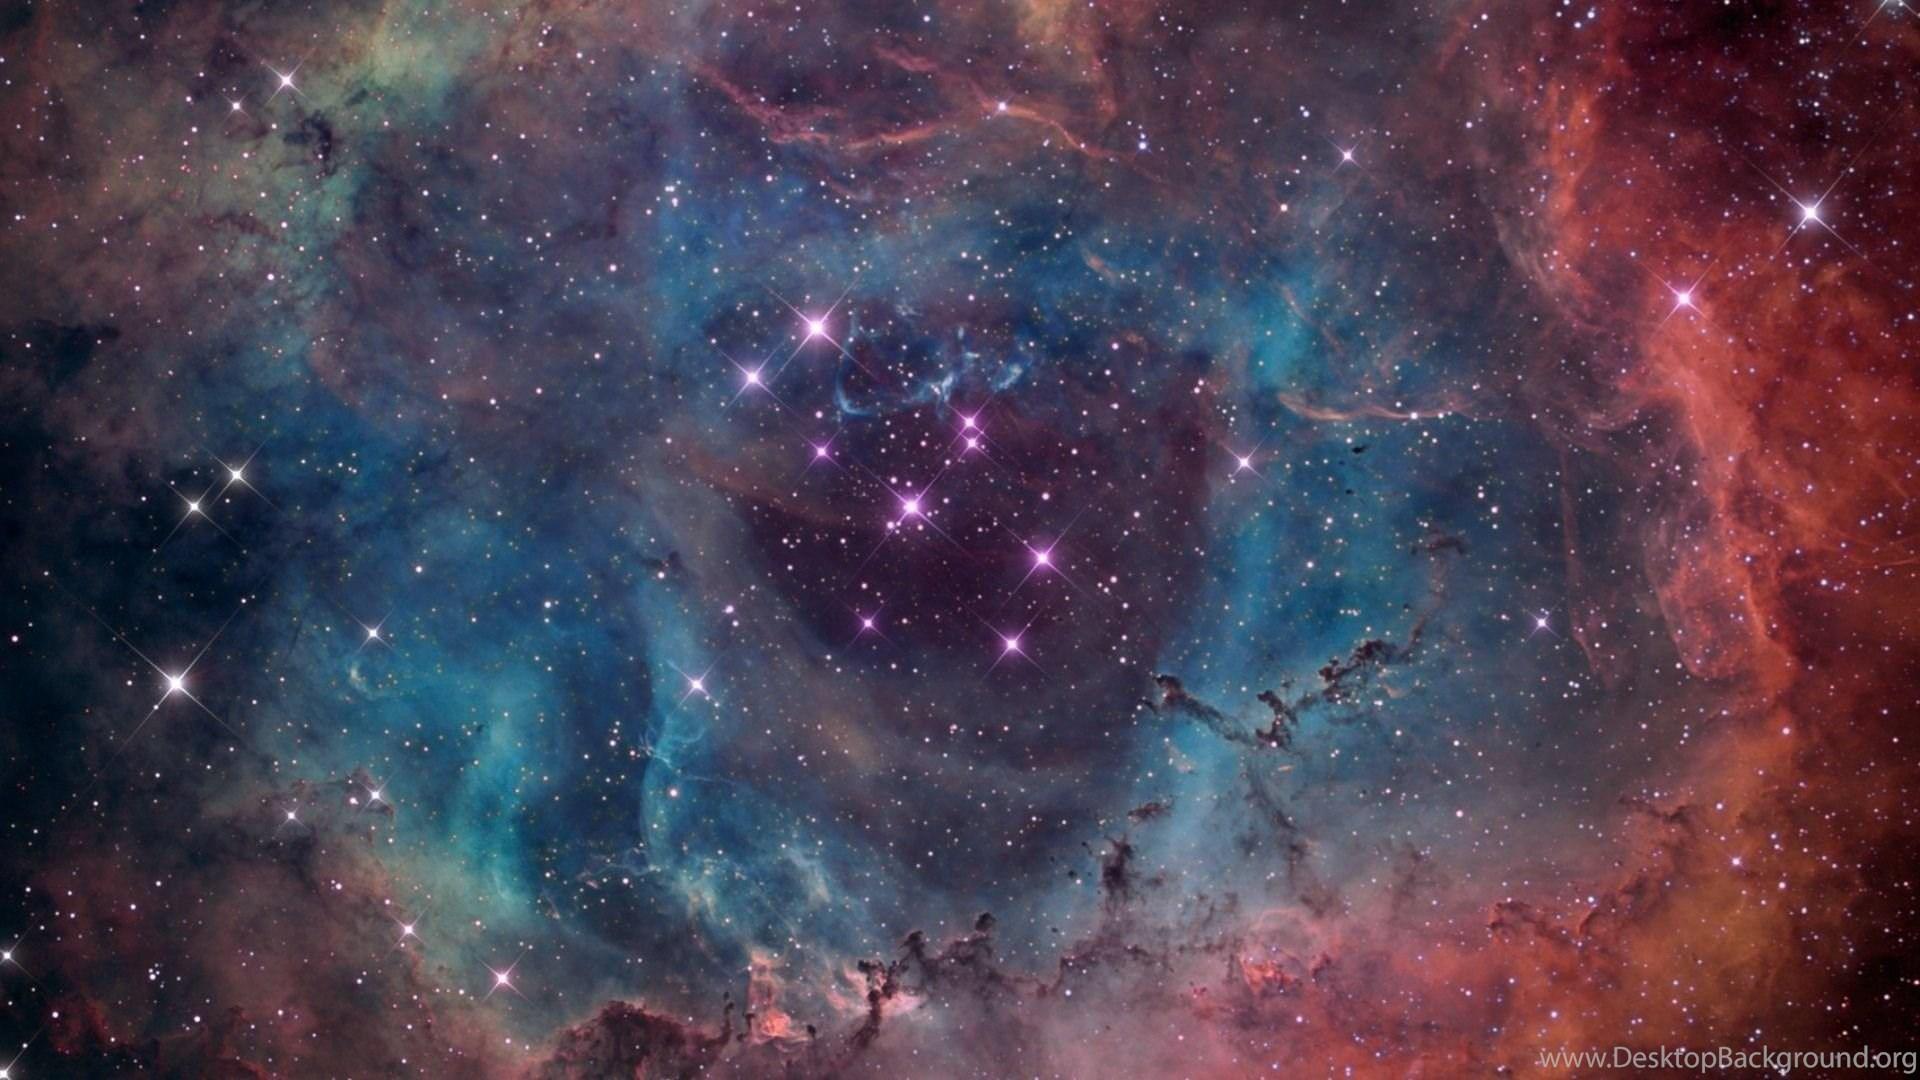 Space Wallpapers 1920x1080 Hubble Pics About Desktop Background